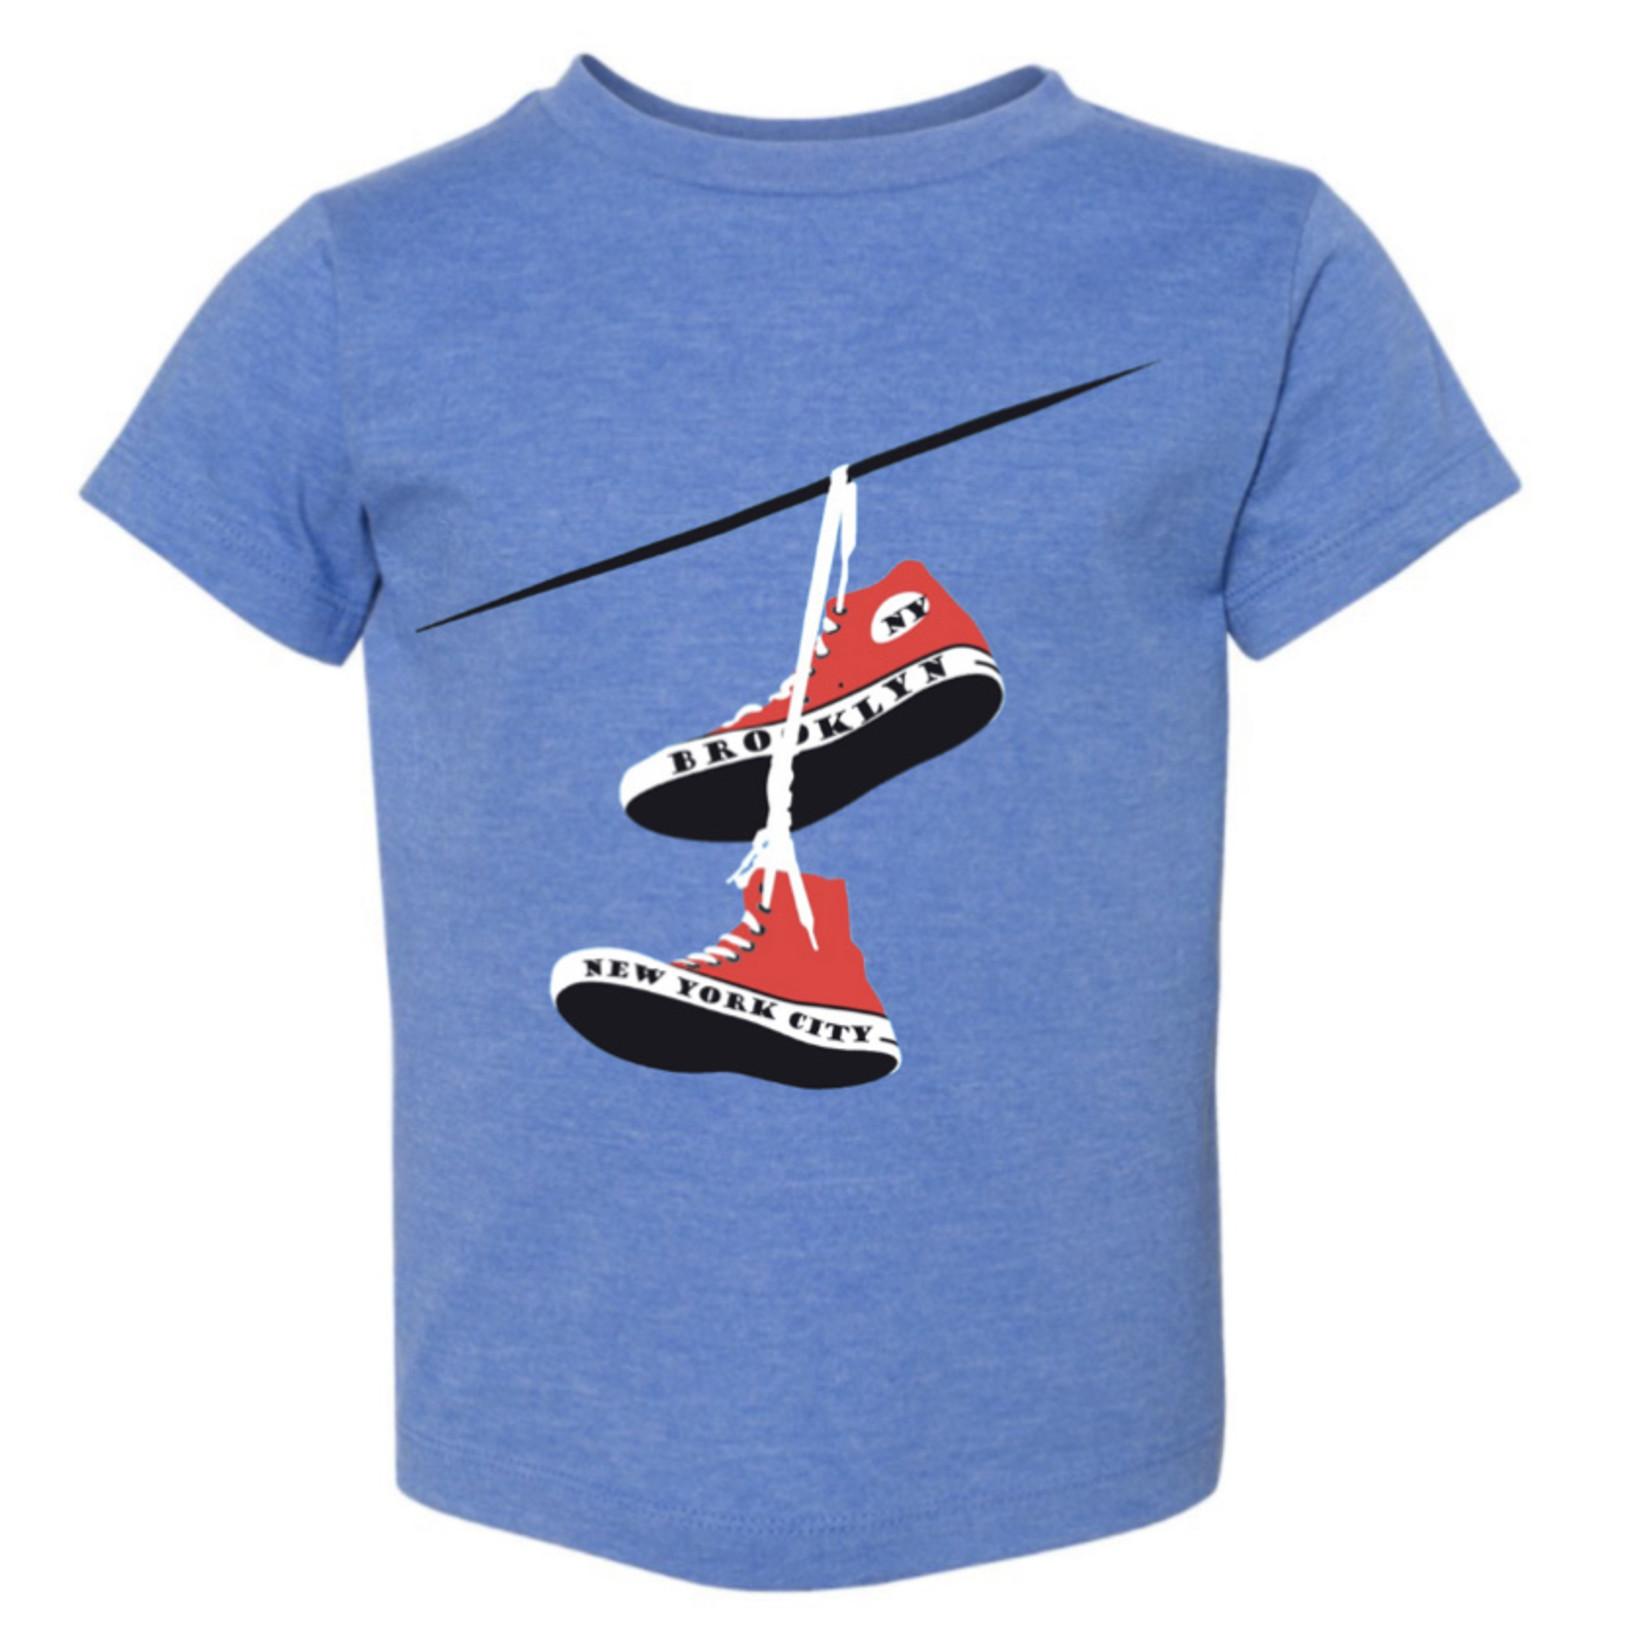 Brooklyn Shoes T-Shirt